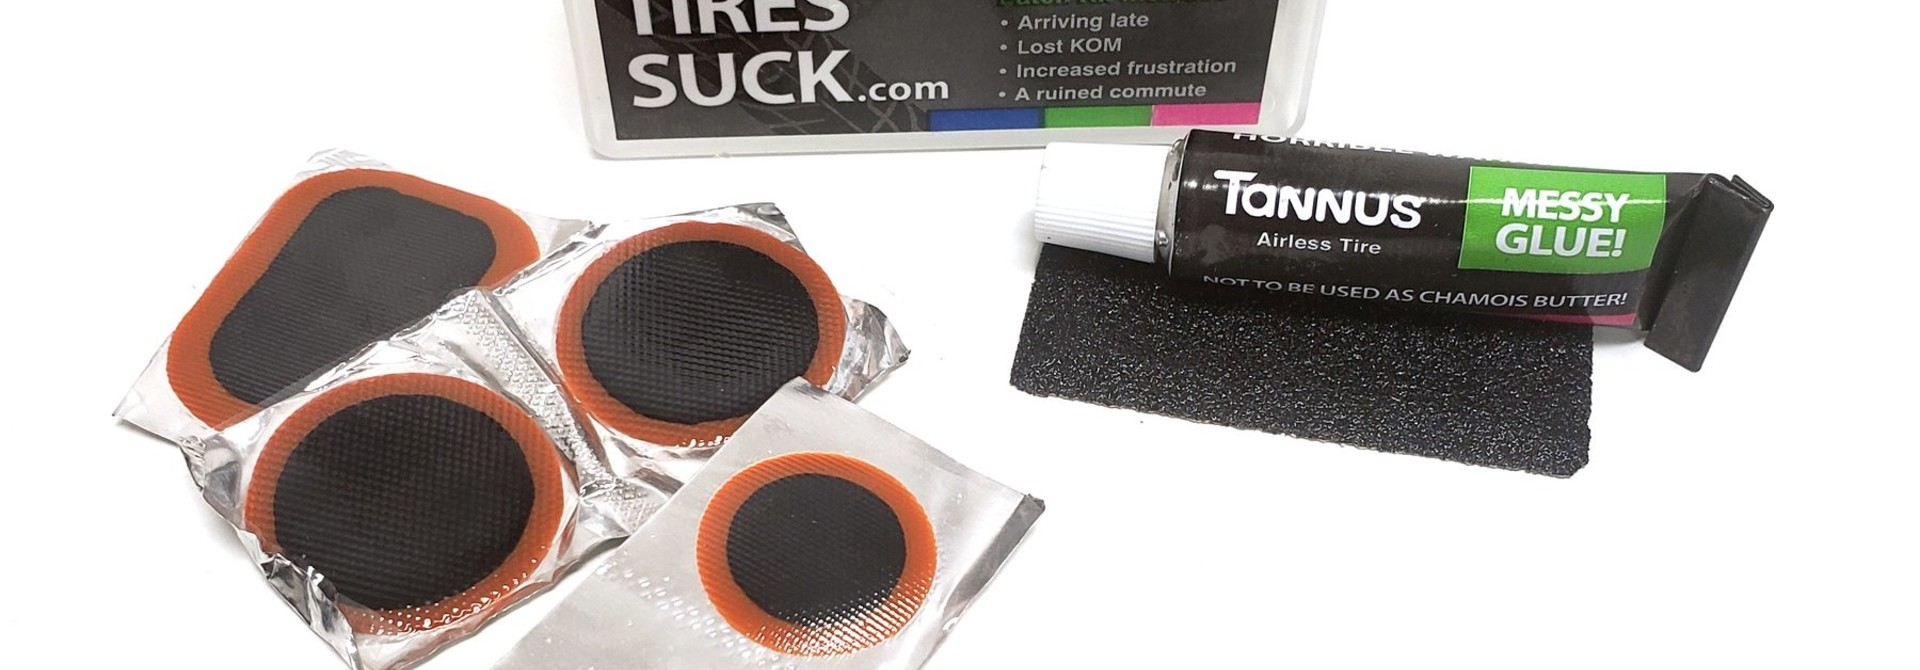 "Tannus ""backup"" Tube Patch Kit"